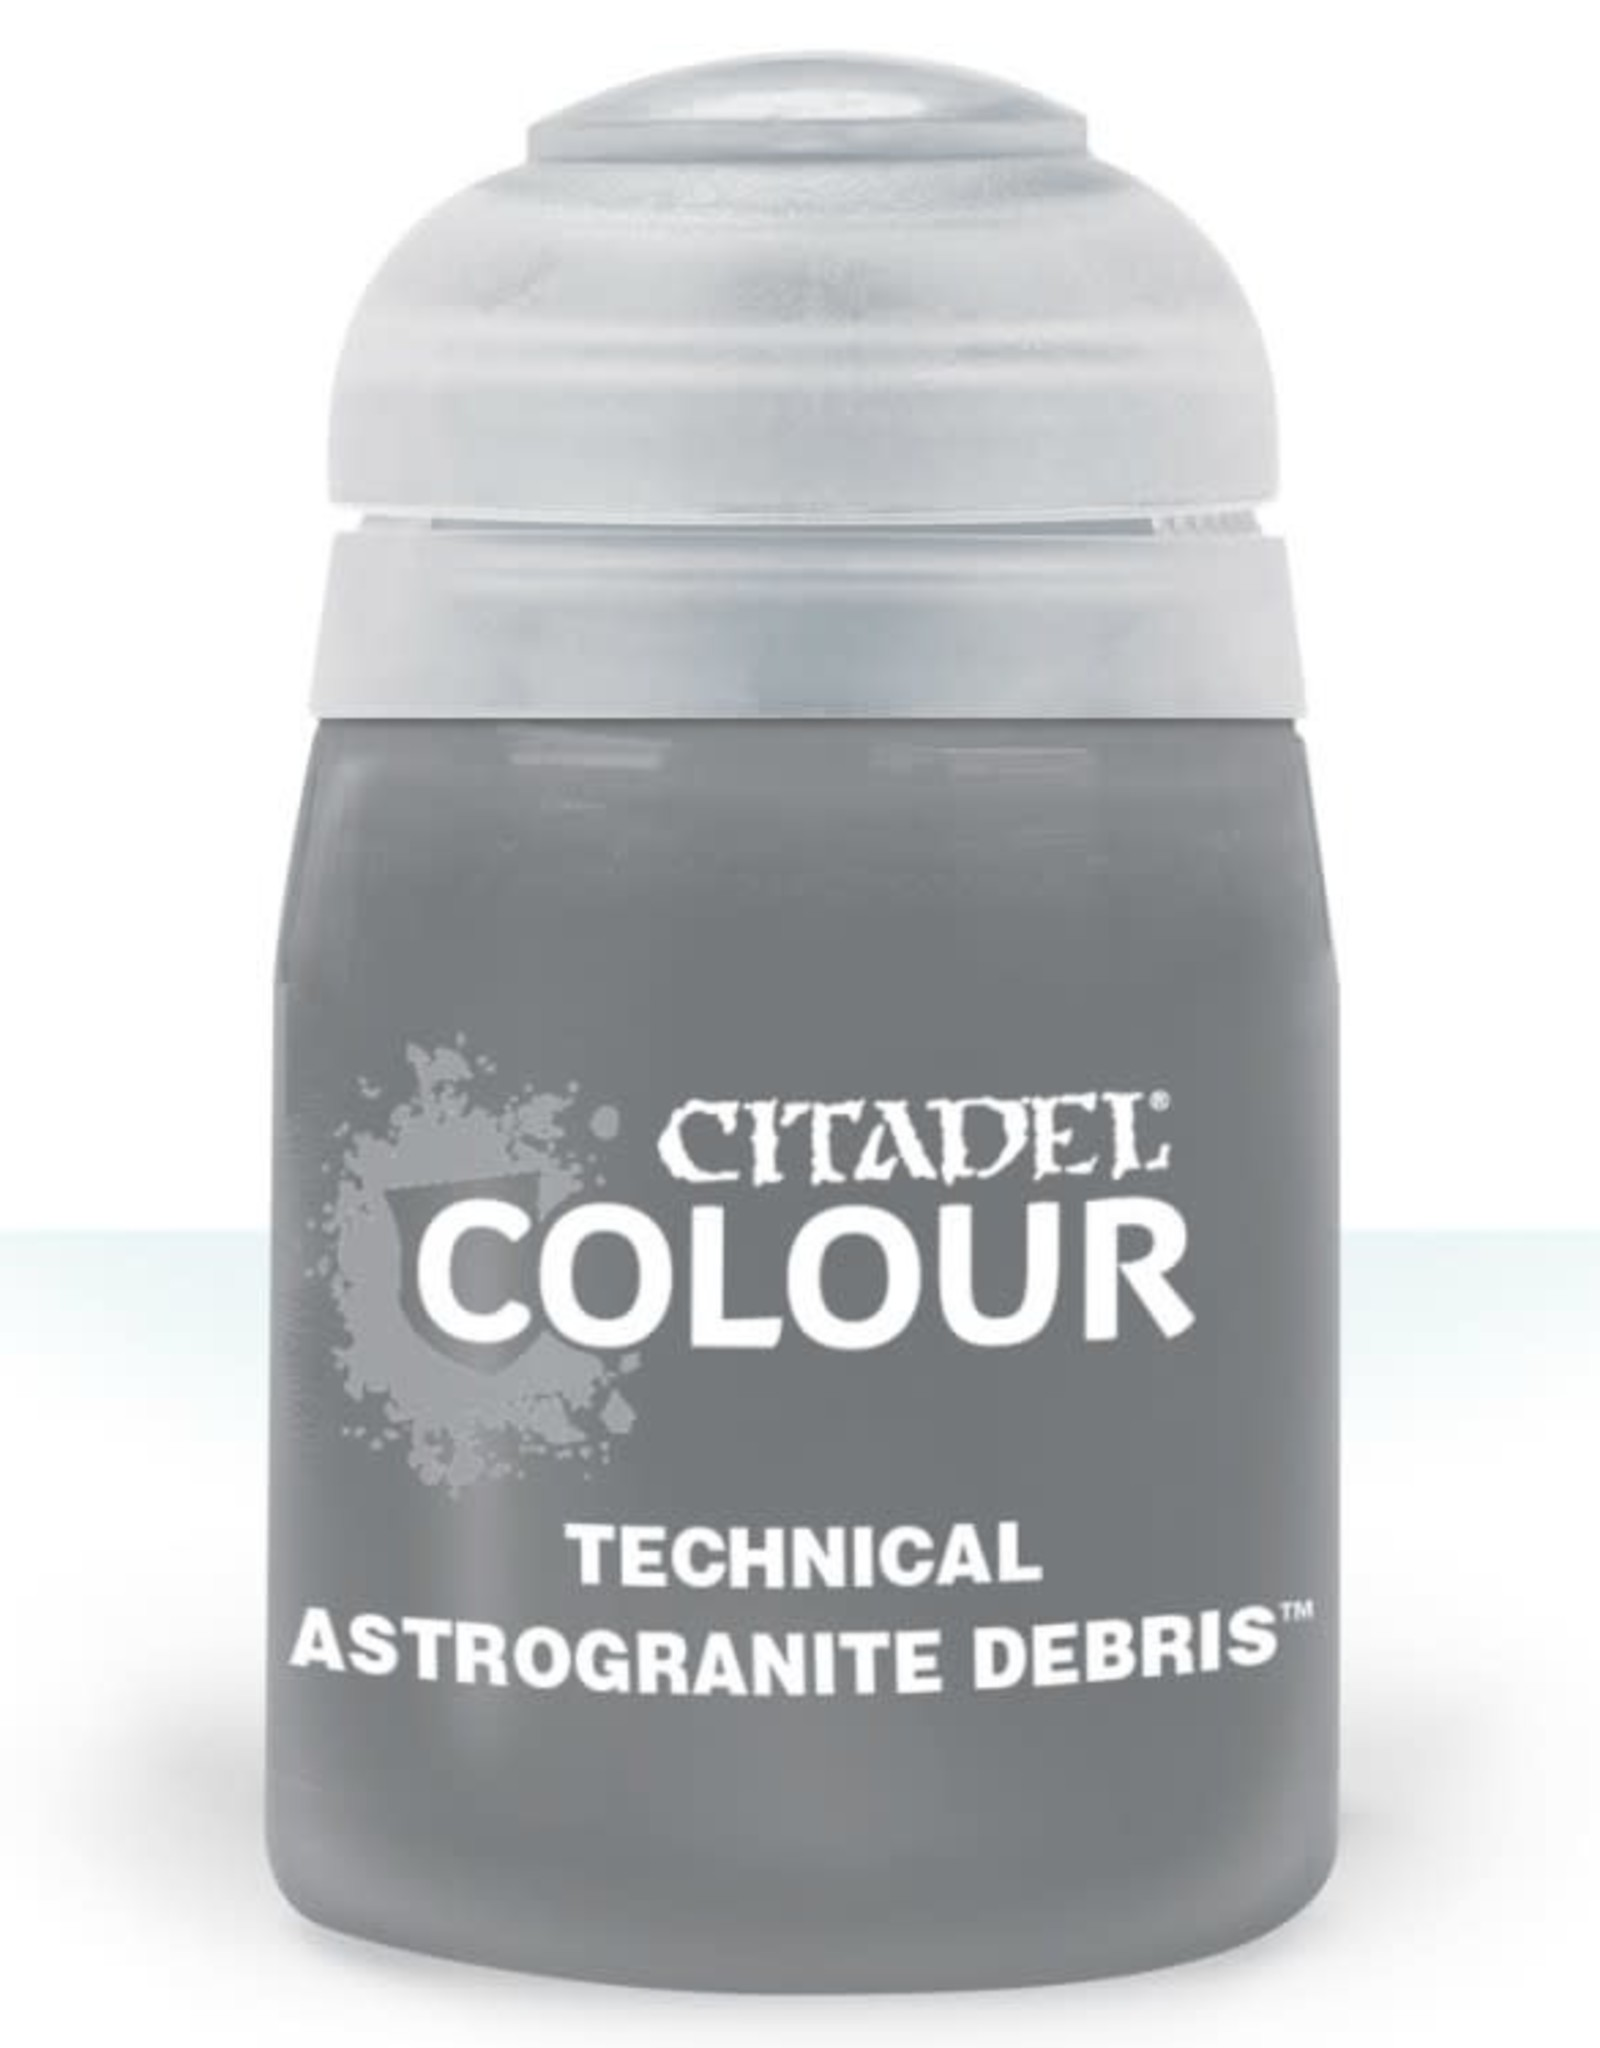 Games Workshop Citadel Paint: Technical - Astrogranite Debris 24ml